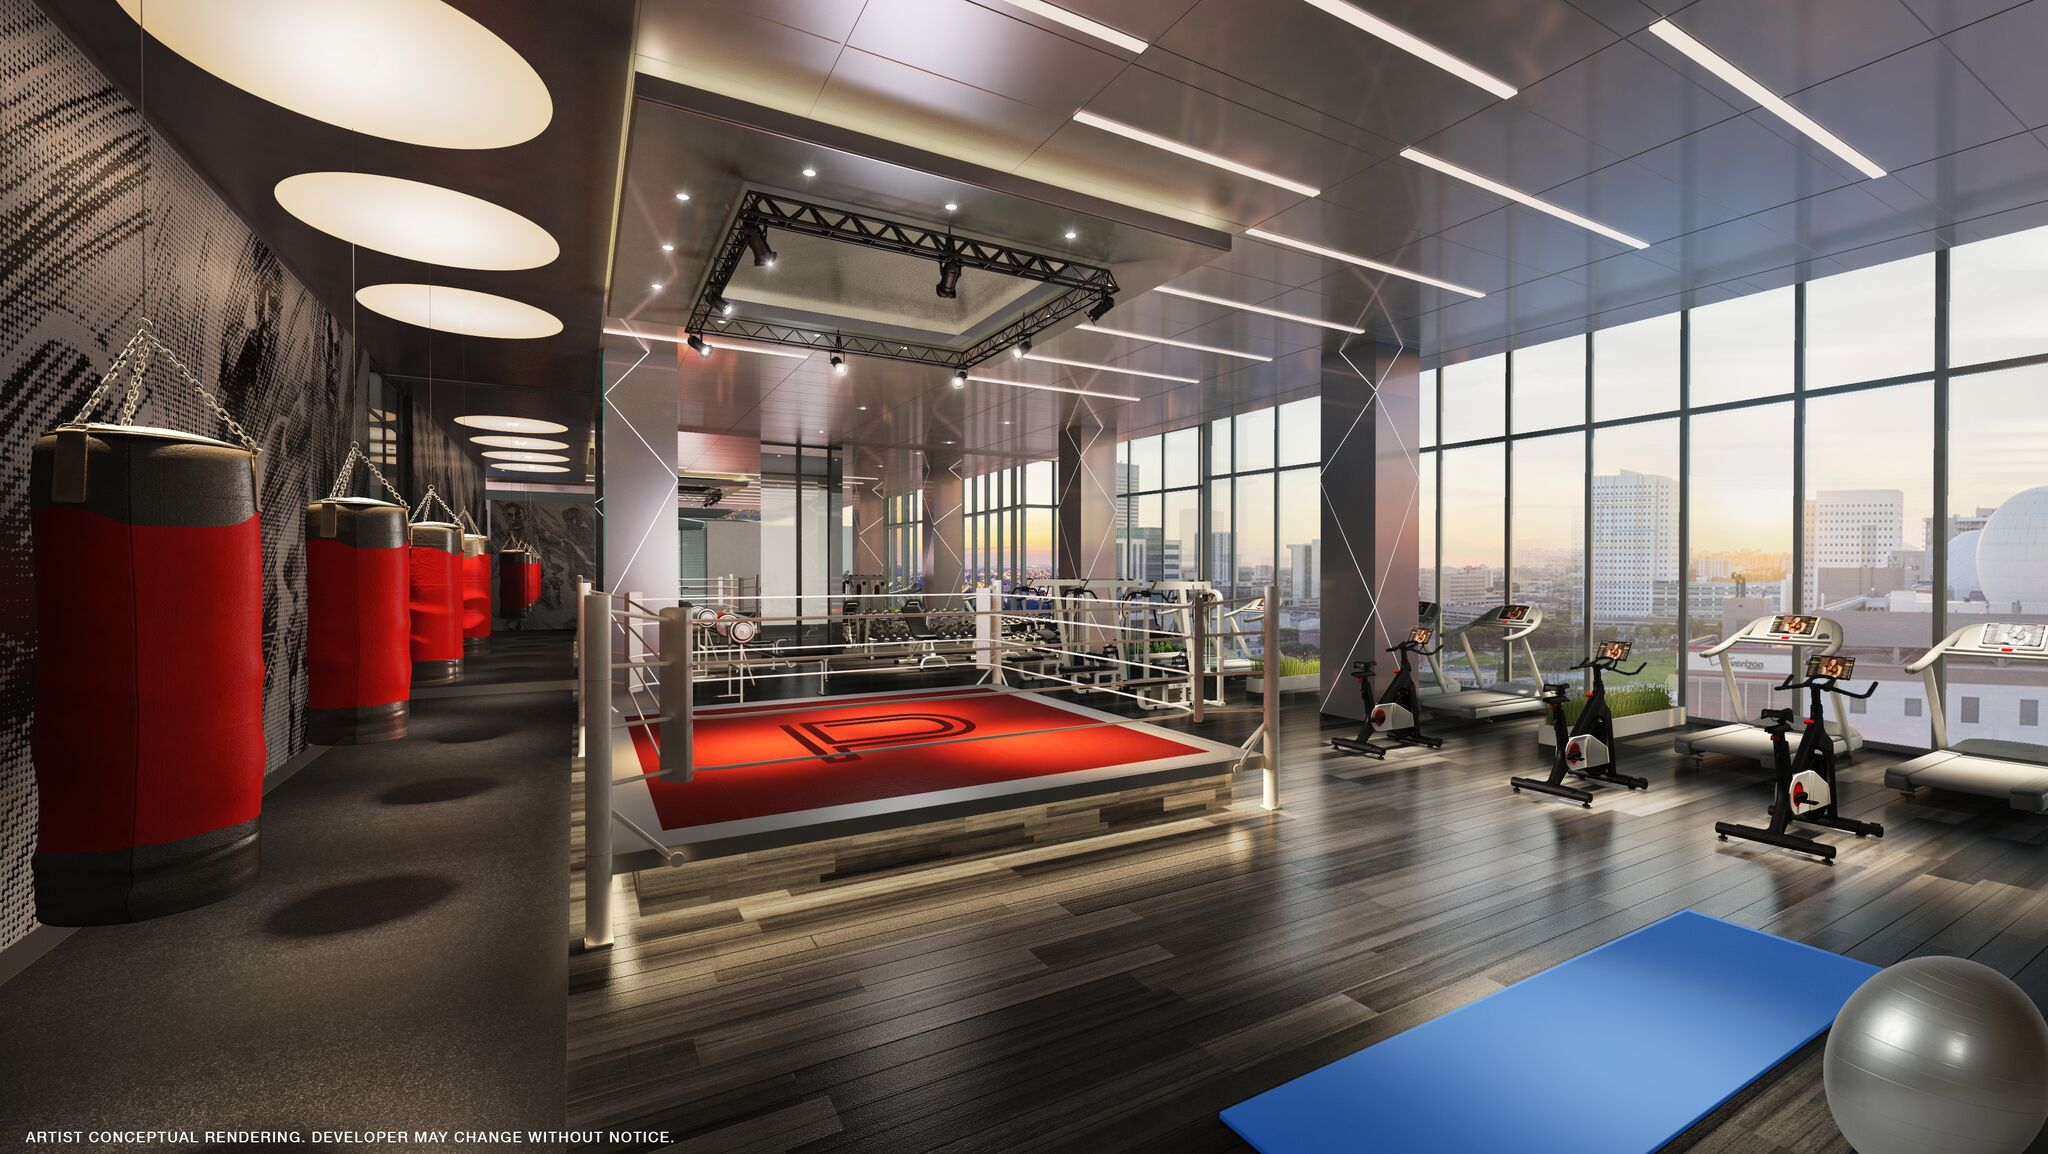 PARAMOUNT_Fitness_center.jpeg